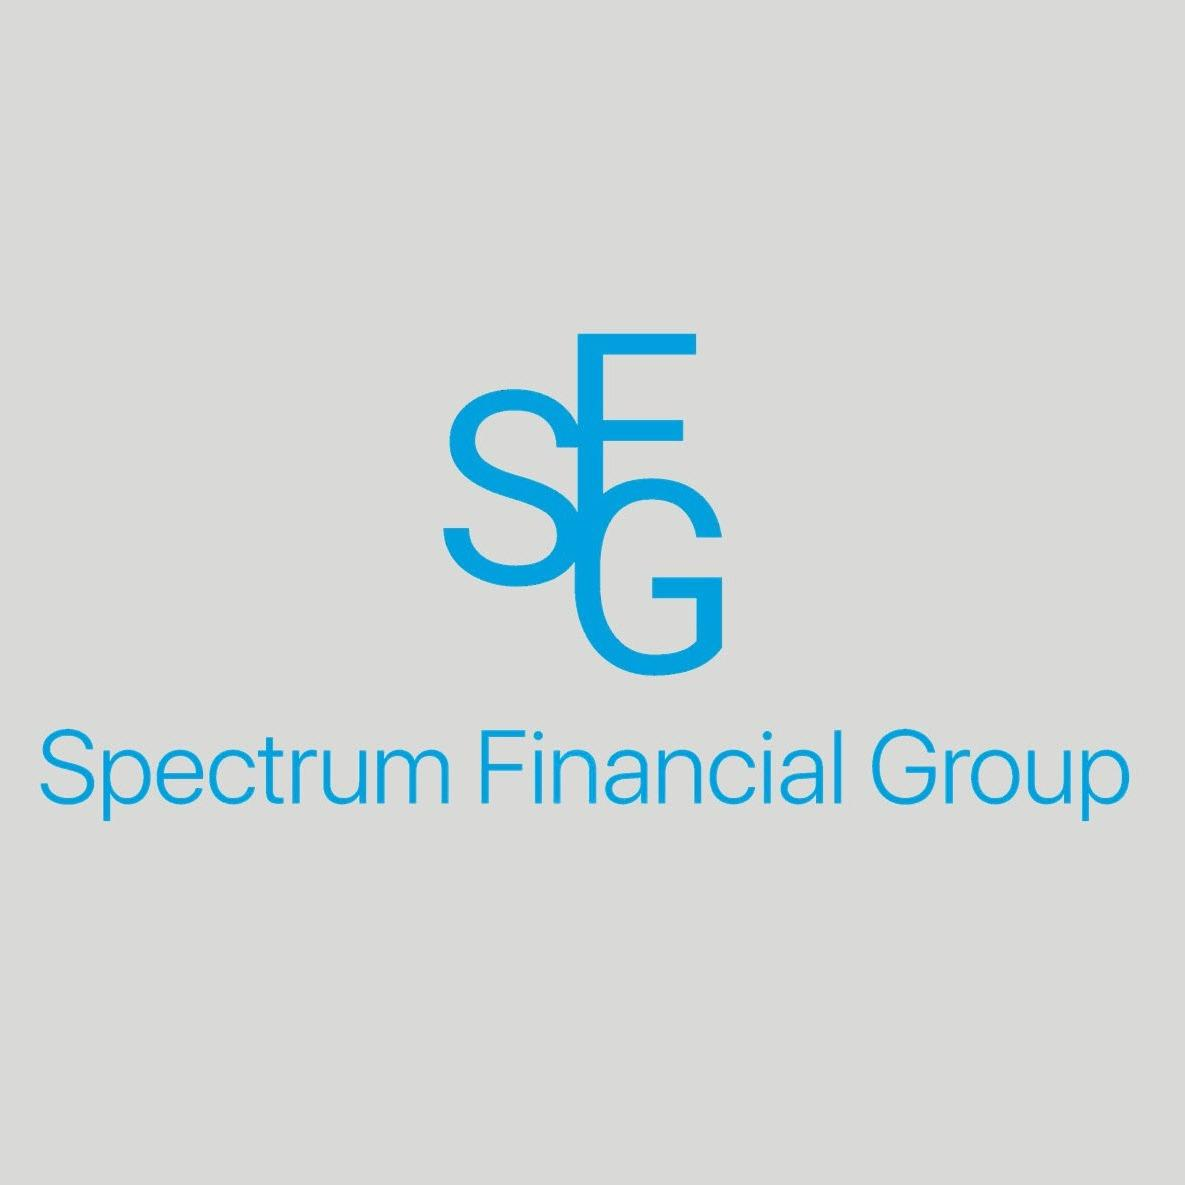 Spectrum Financial Group